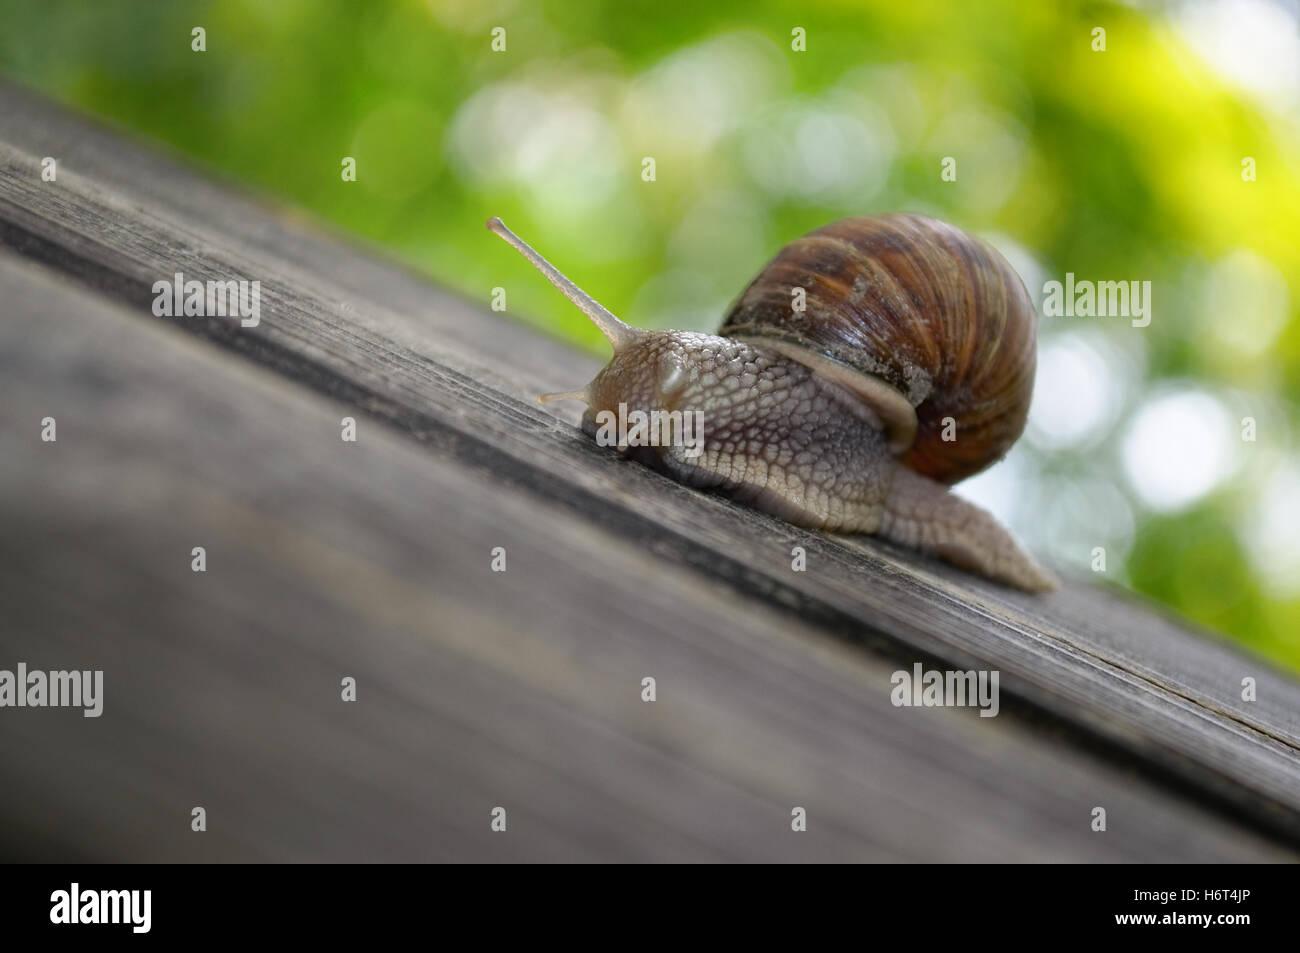 invertebrates - Stock Image